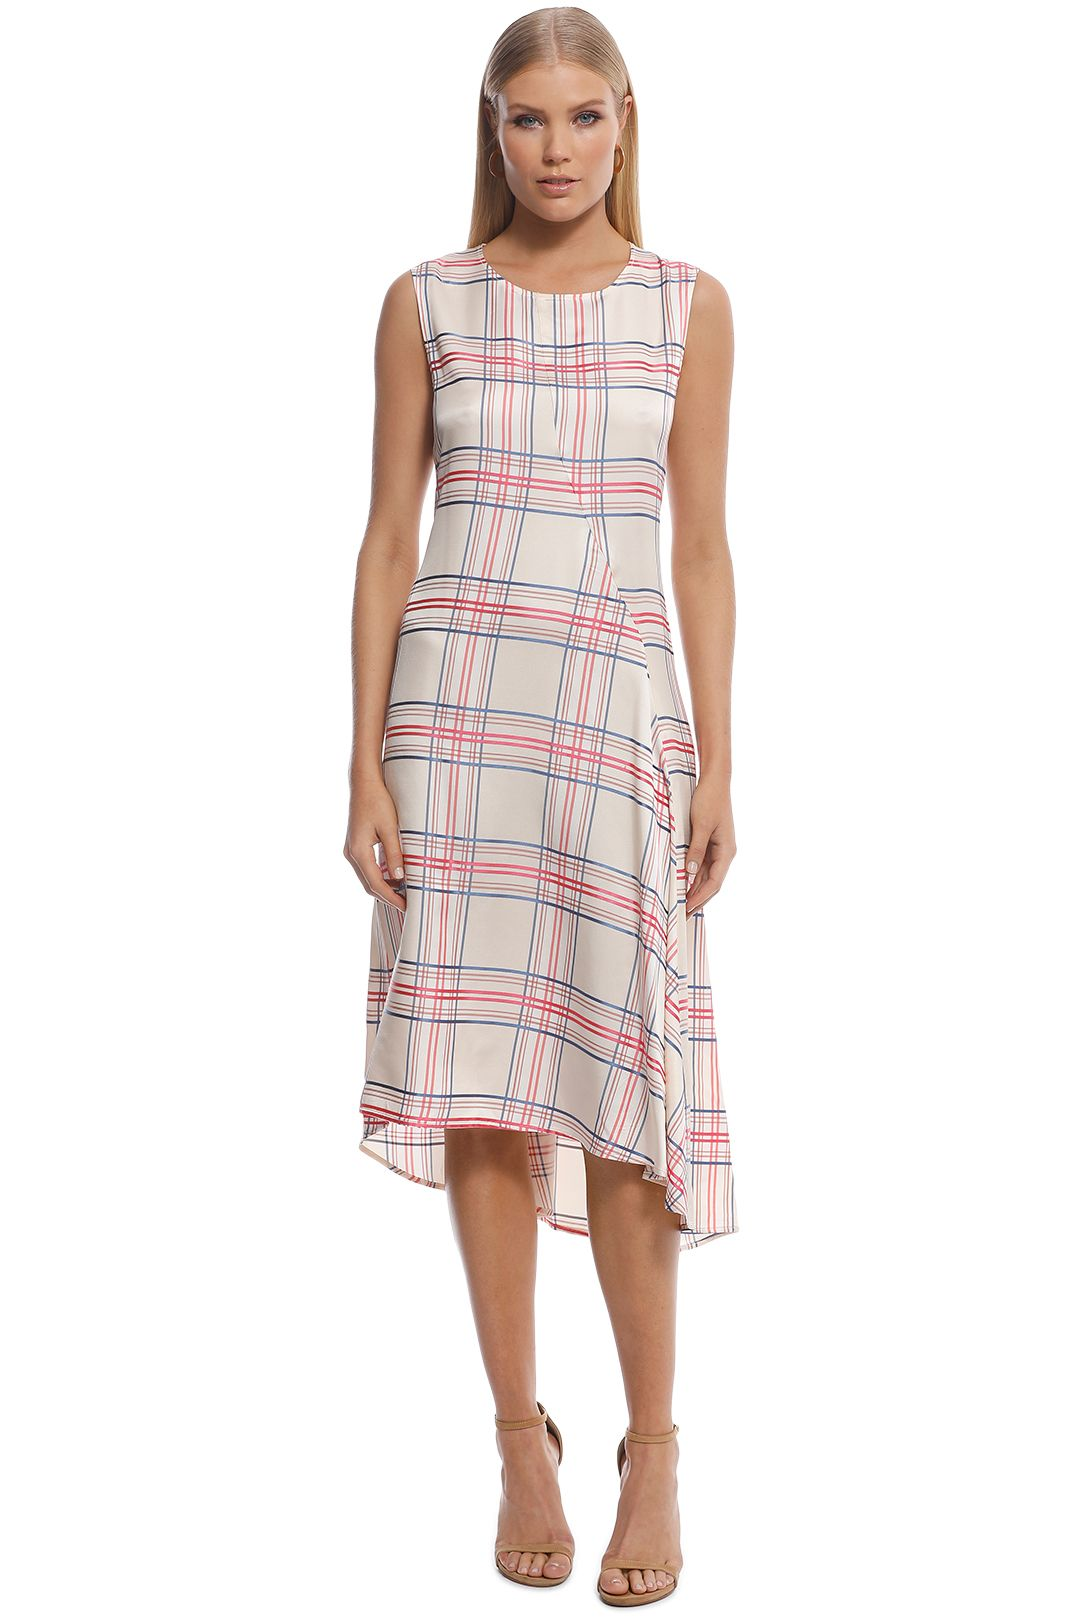 scanlan theodore - check slip dress - multi - front